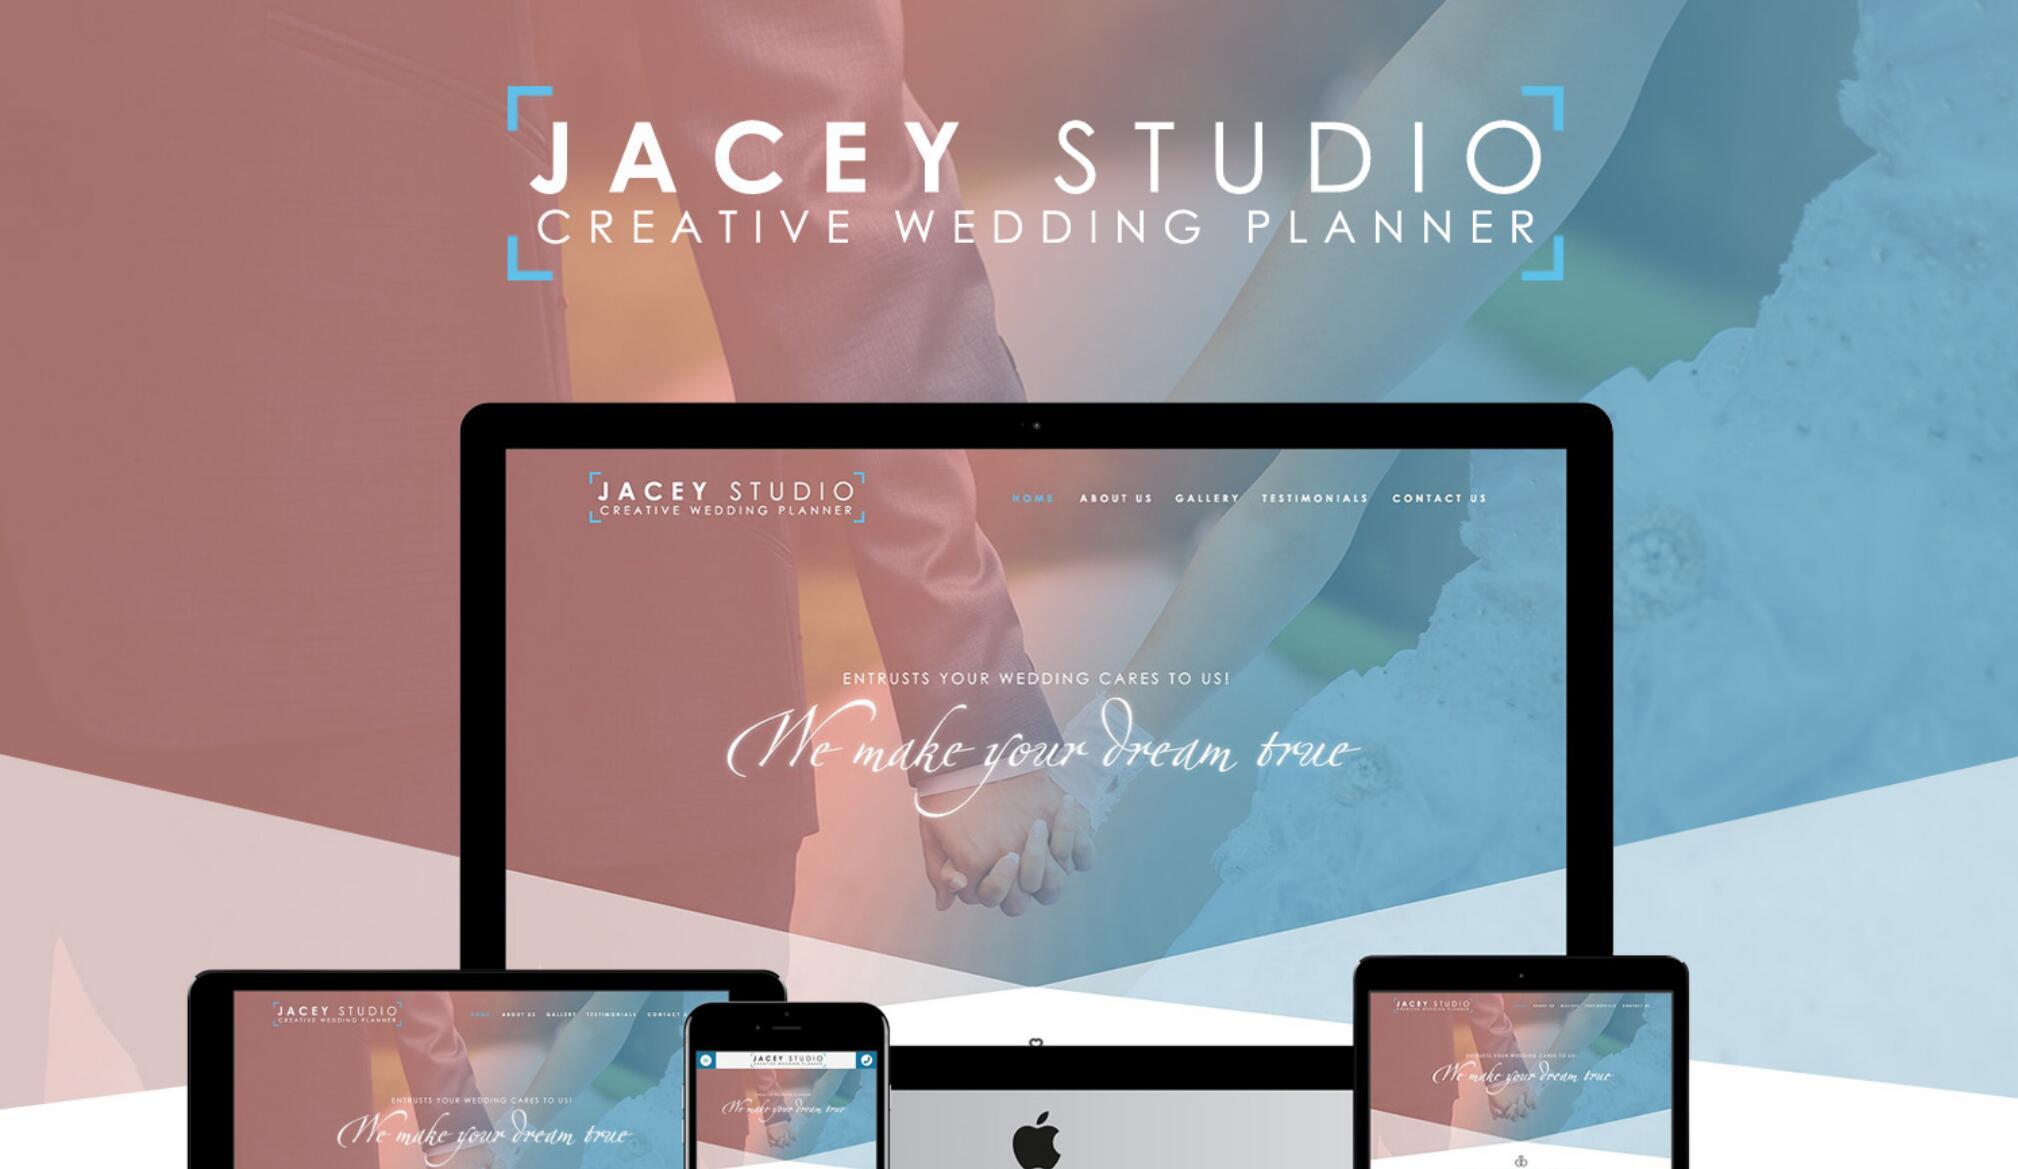 JaceyStudio - 创意婚礼策划师网站设计